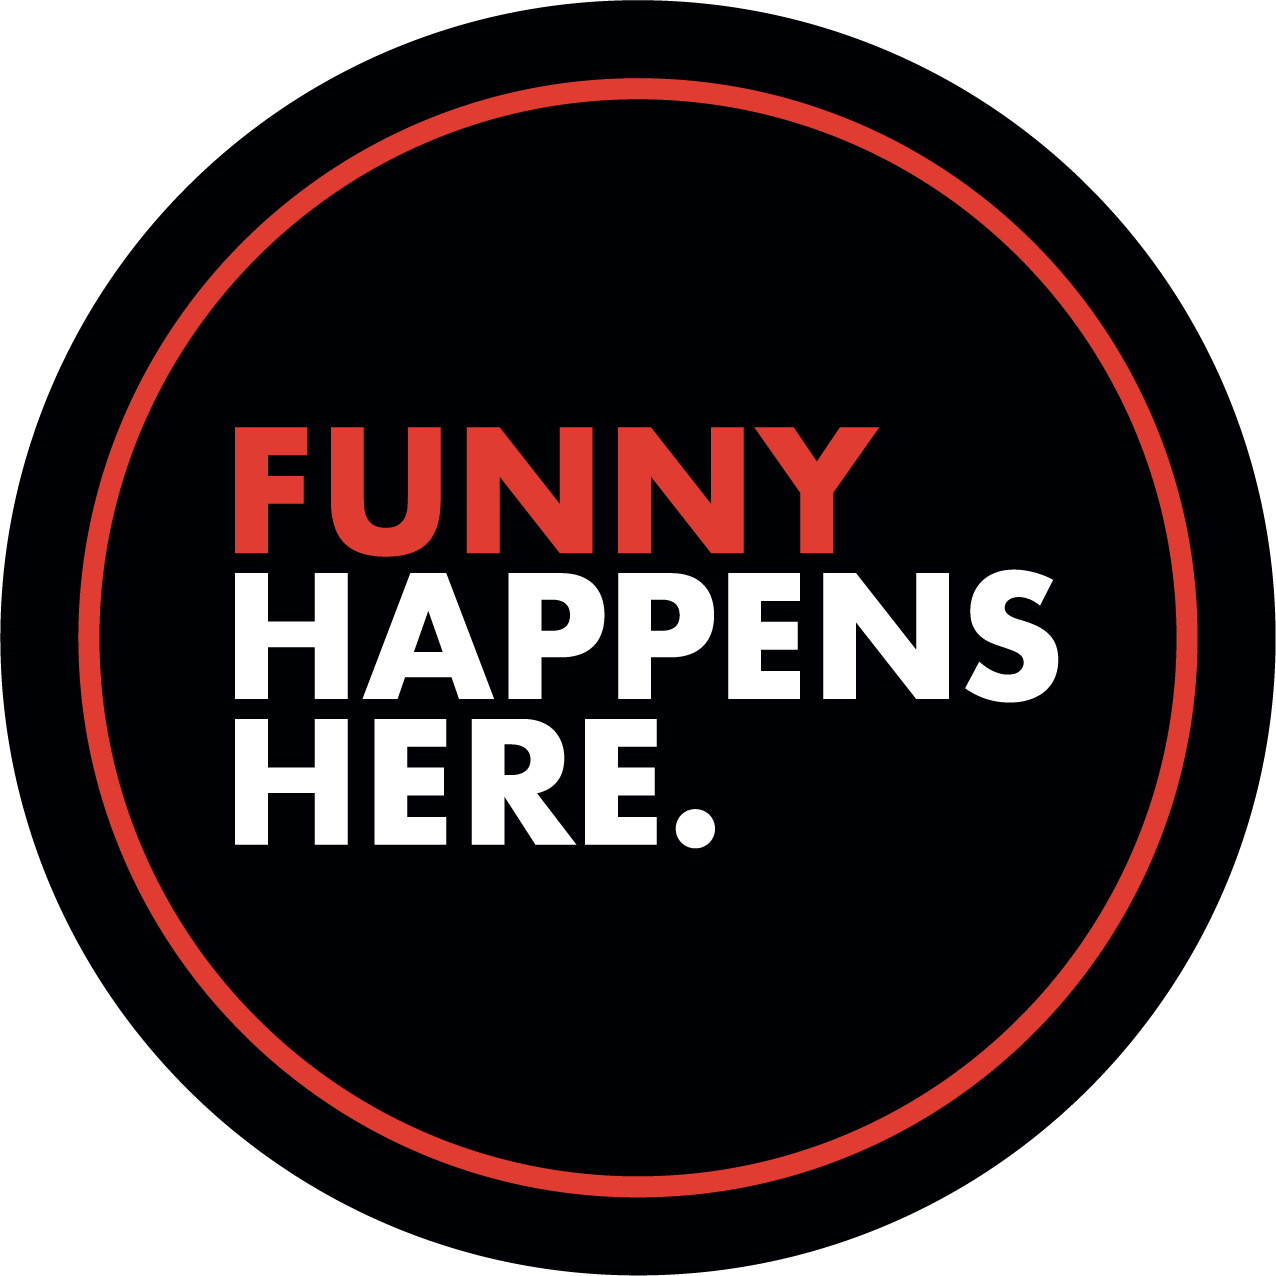 FunnyHappensHere 01